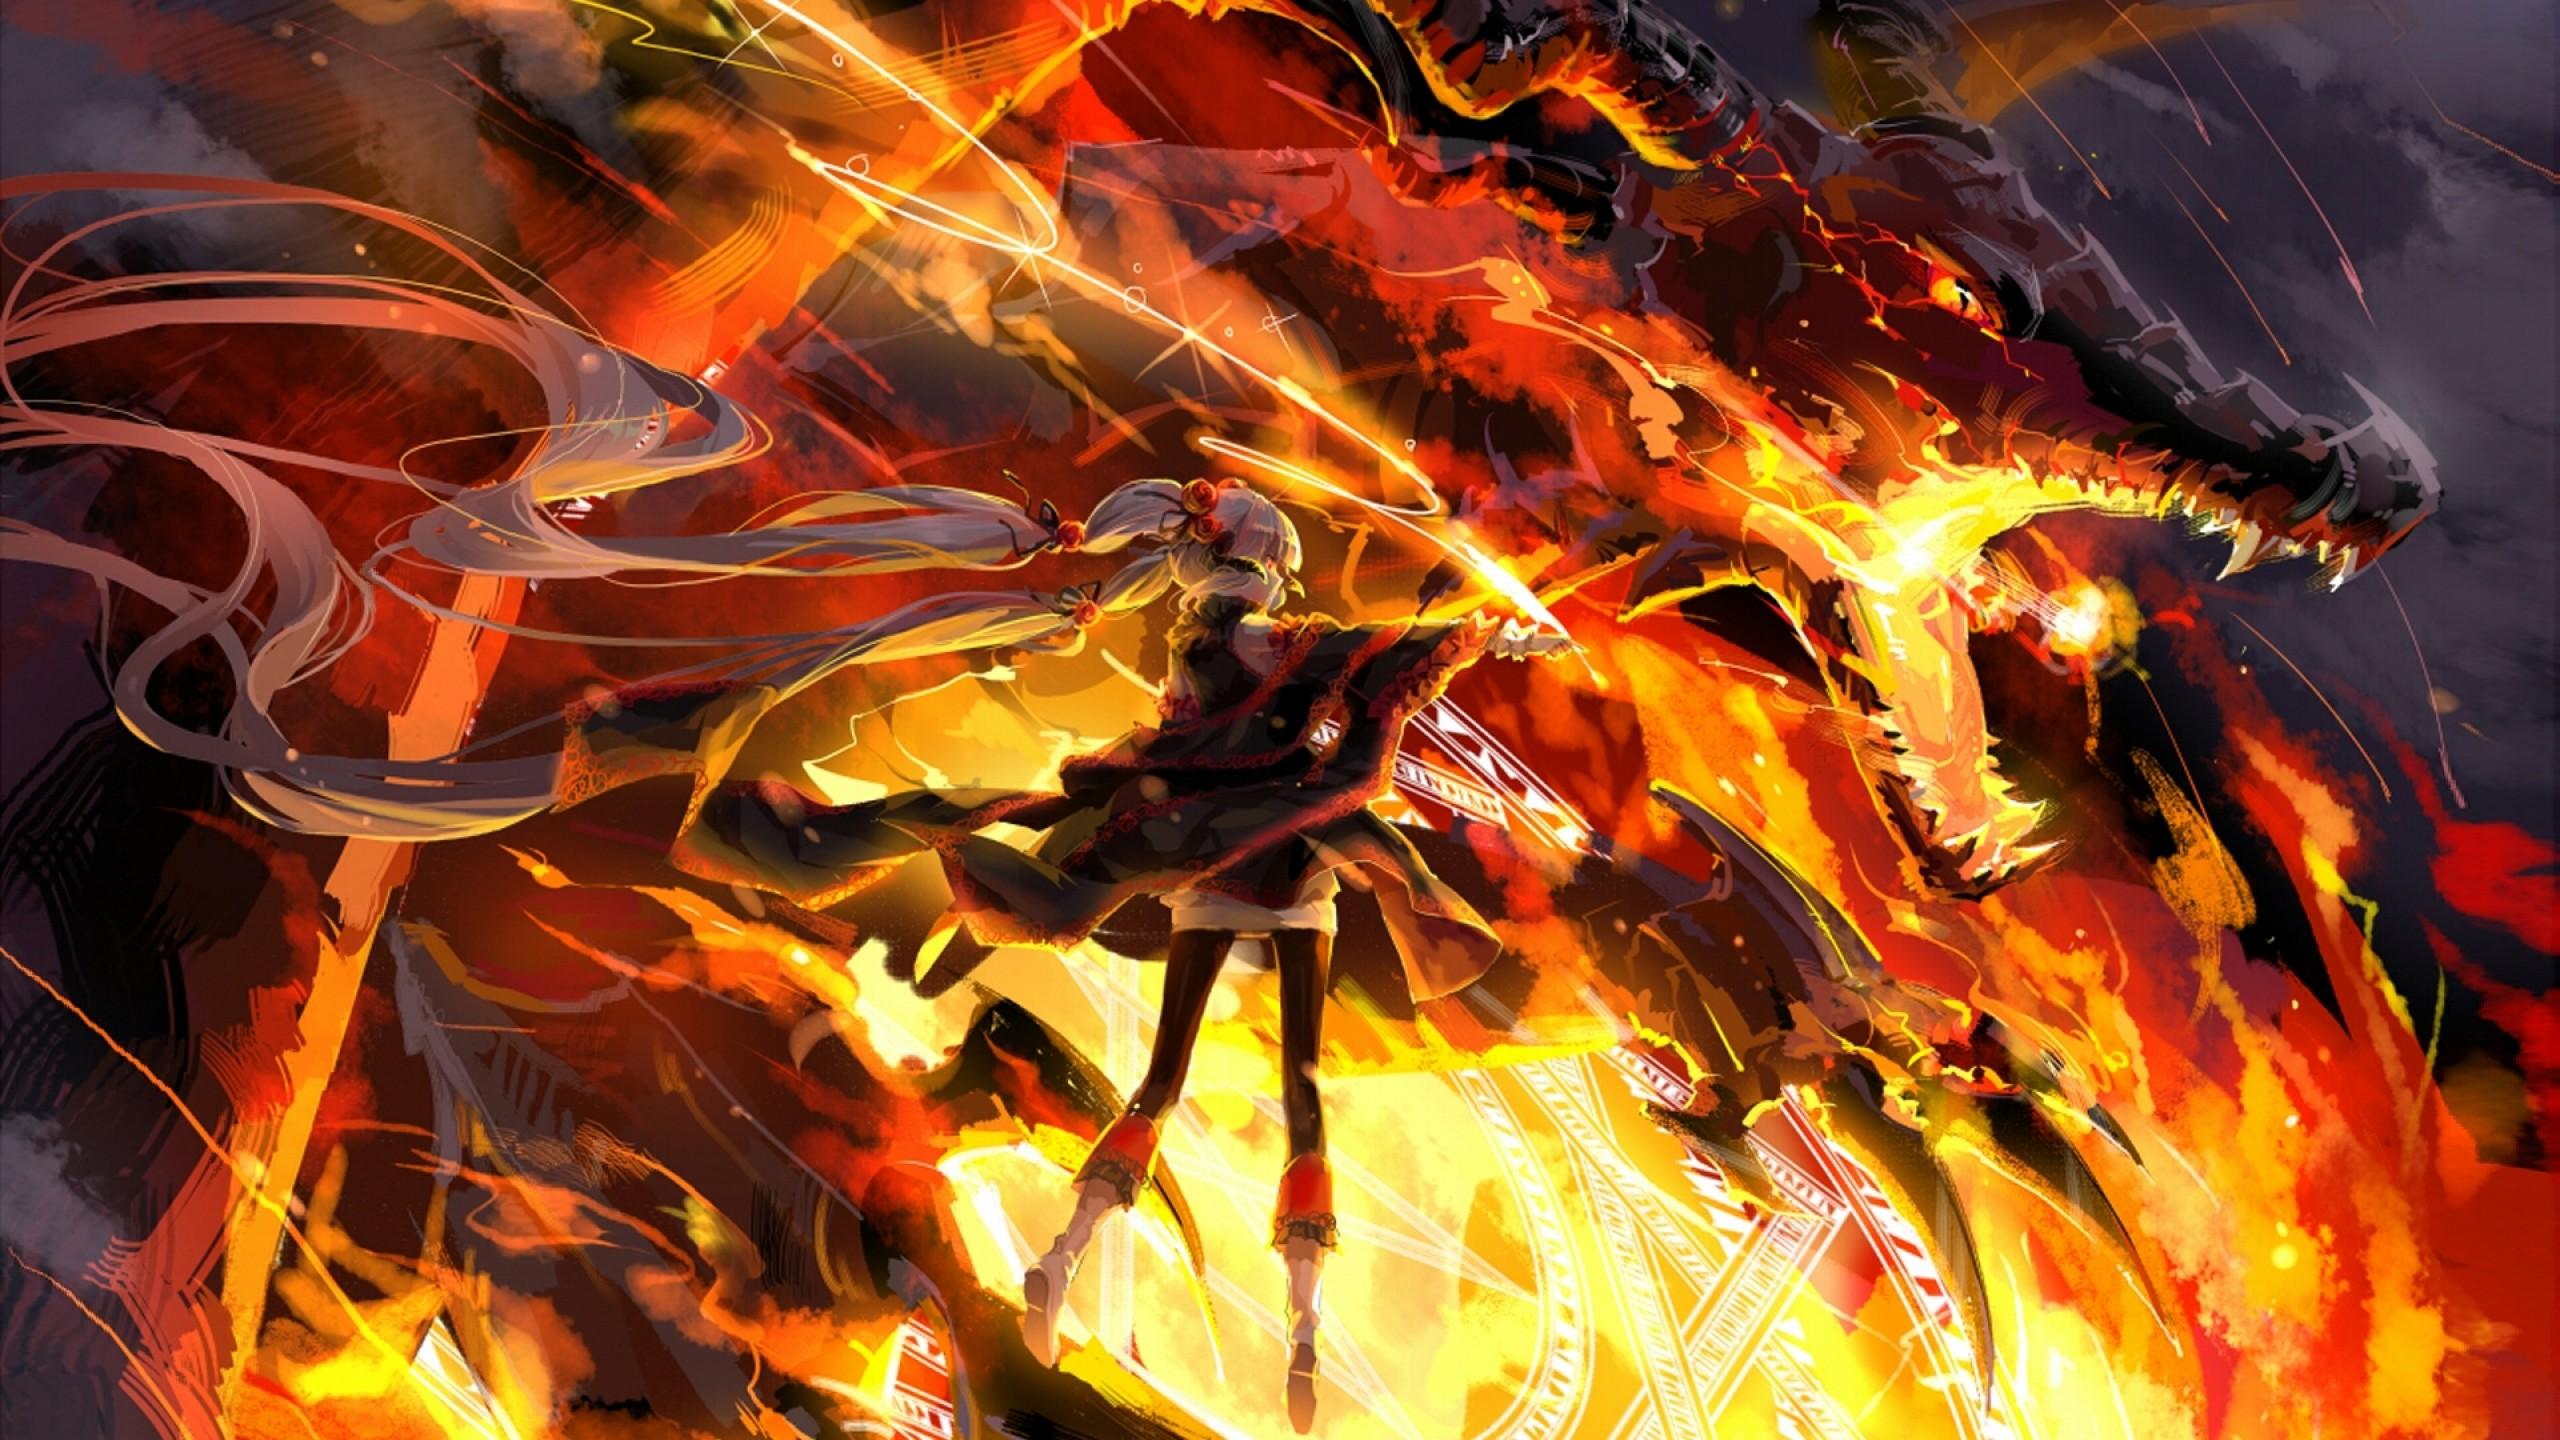 dragons fire anime Wallpaper HD